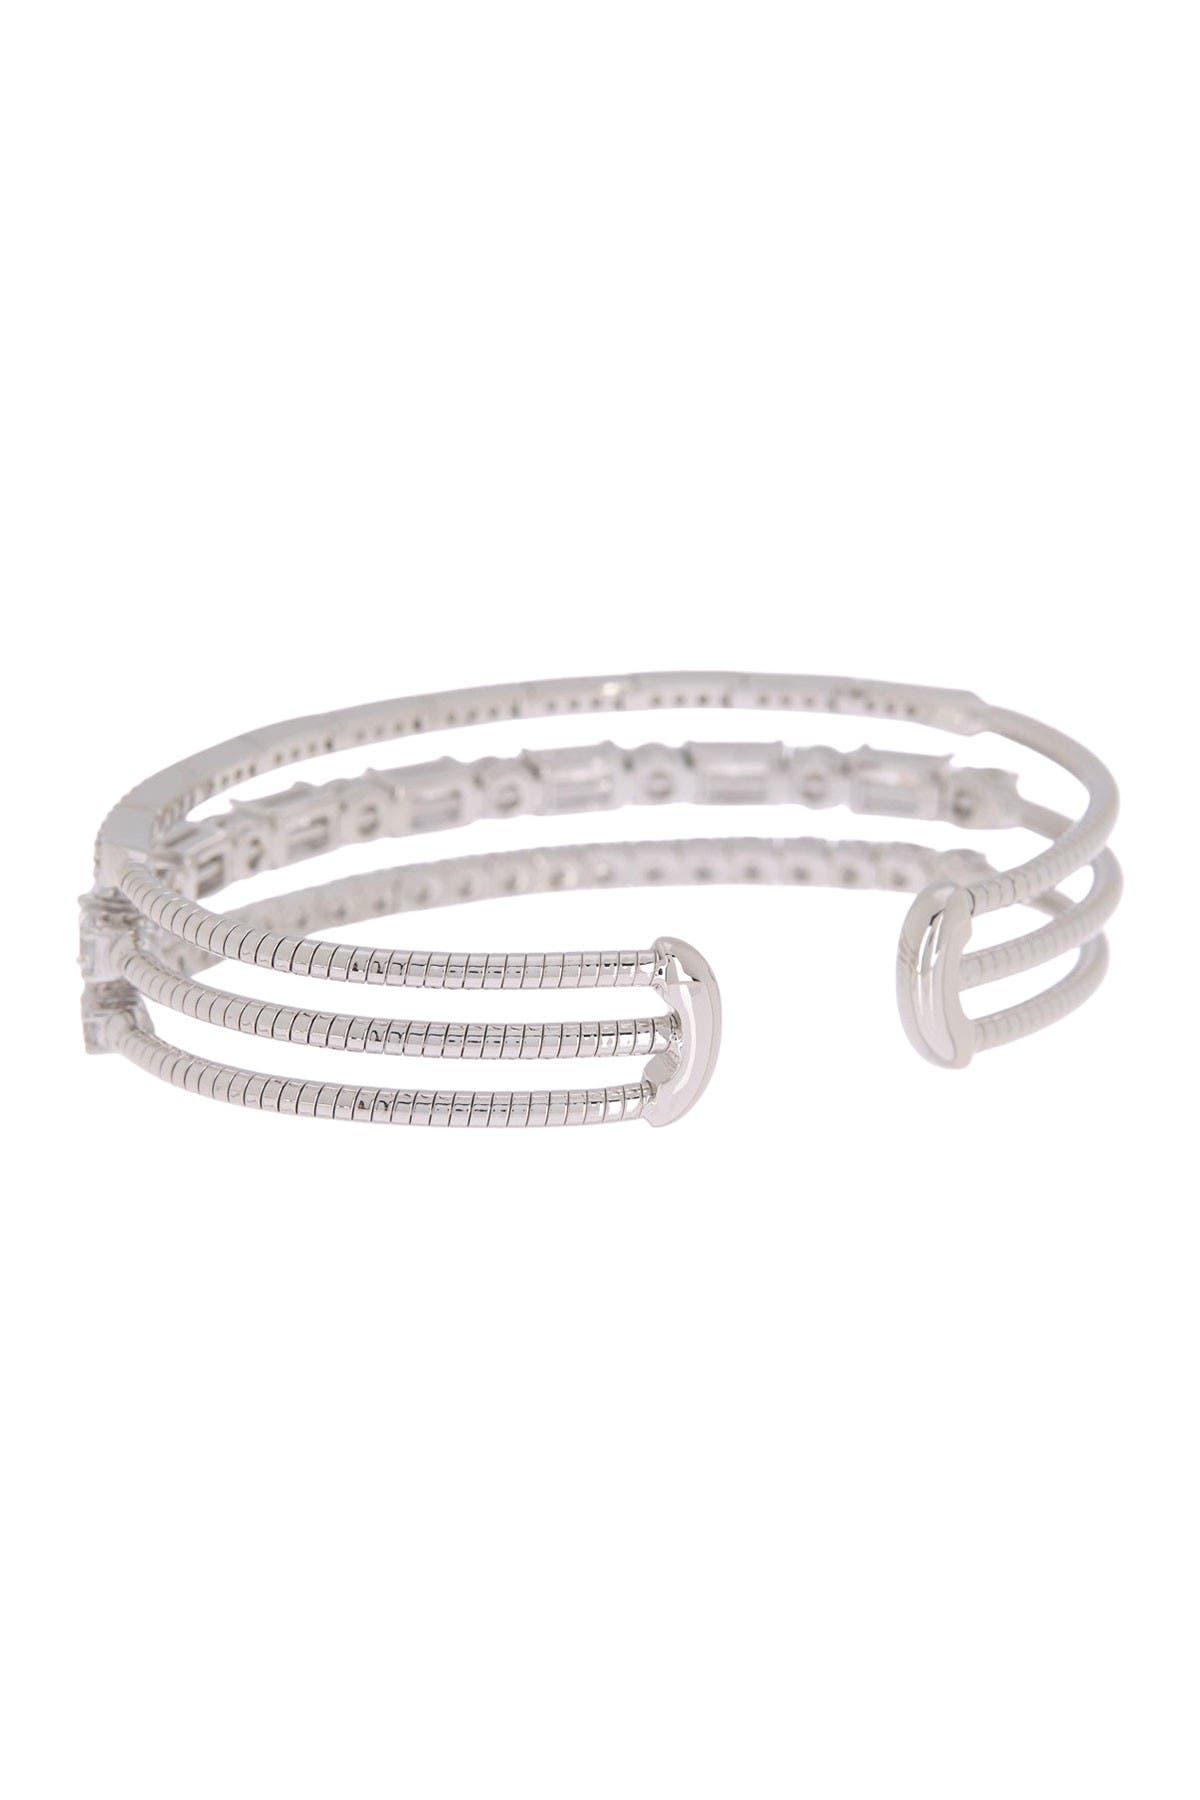 Image of NADRI Rae Pave CZ 3-Row Flex Cuff Bracelet